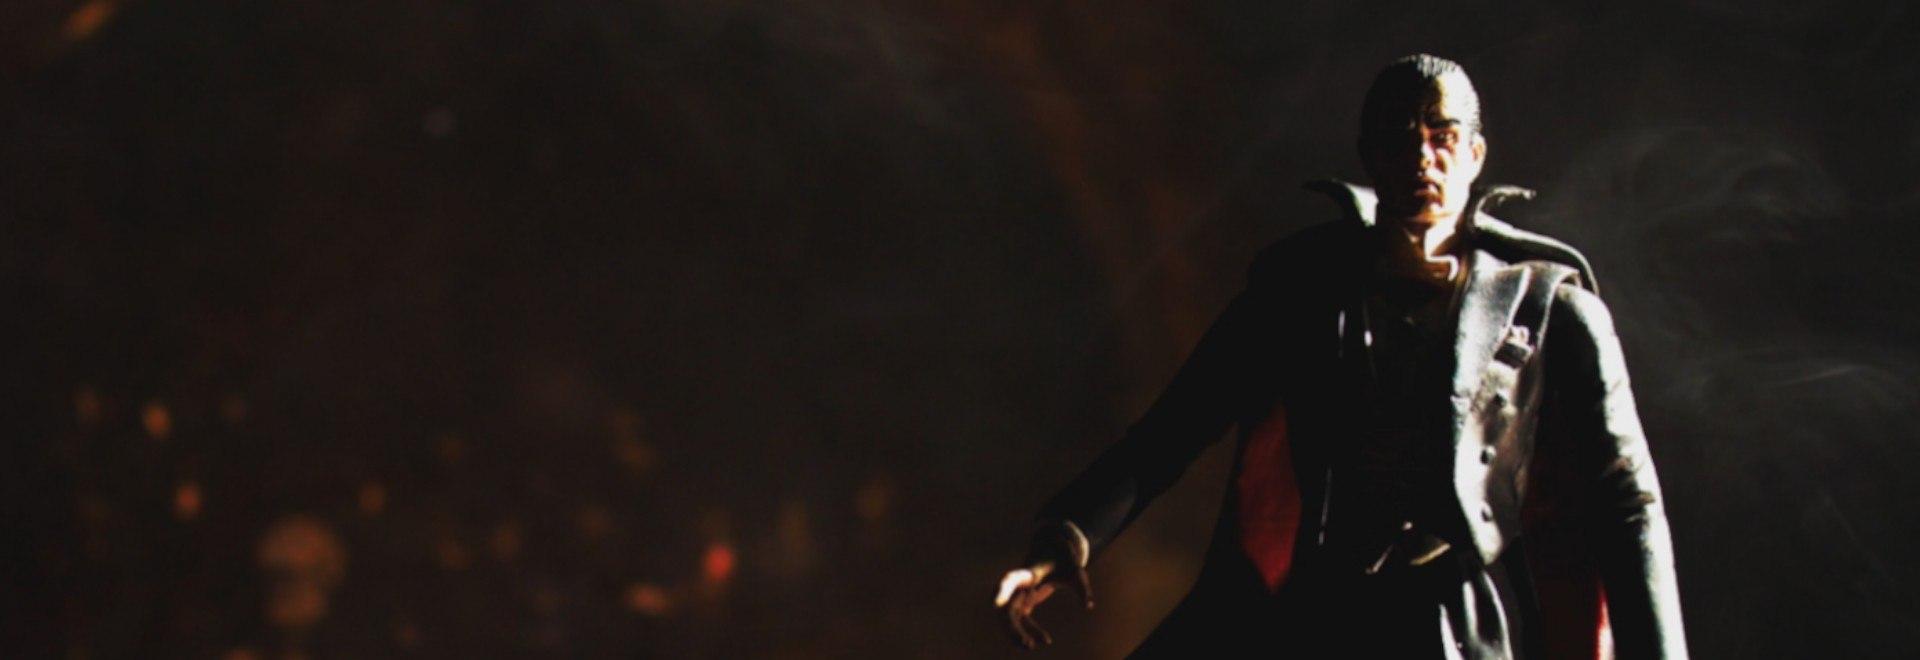 Dracula - L'eterno